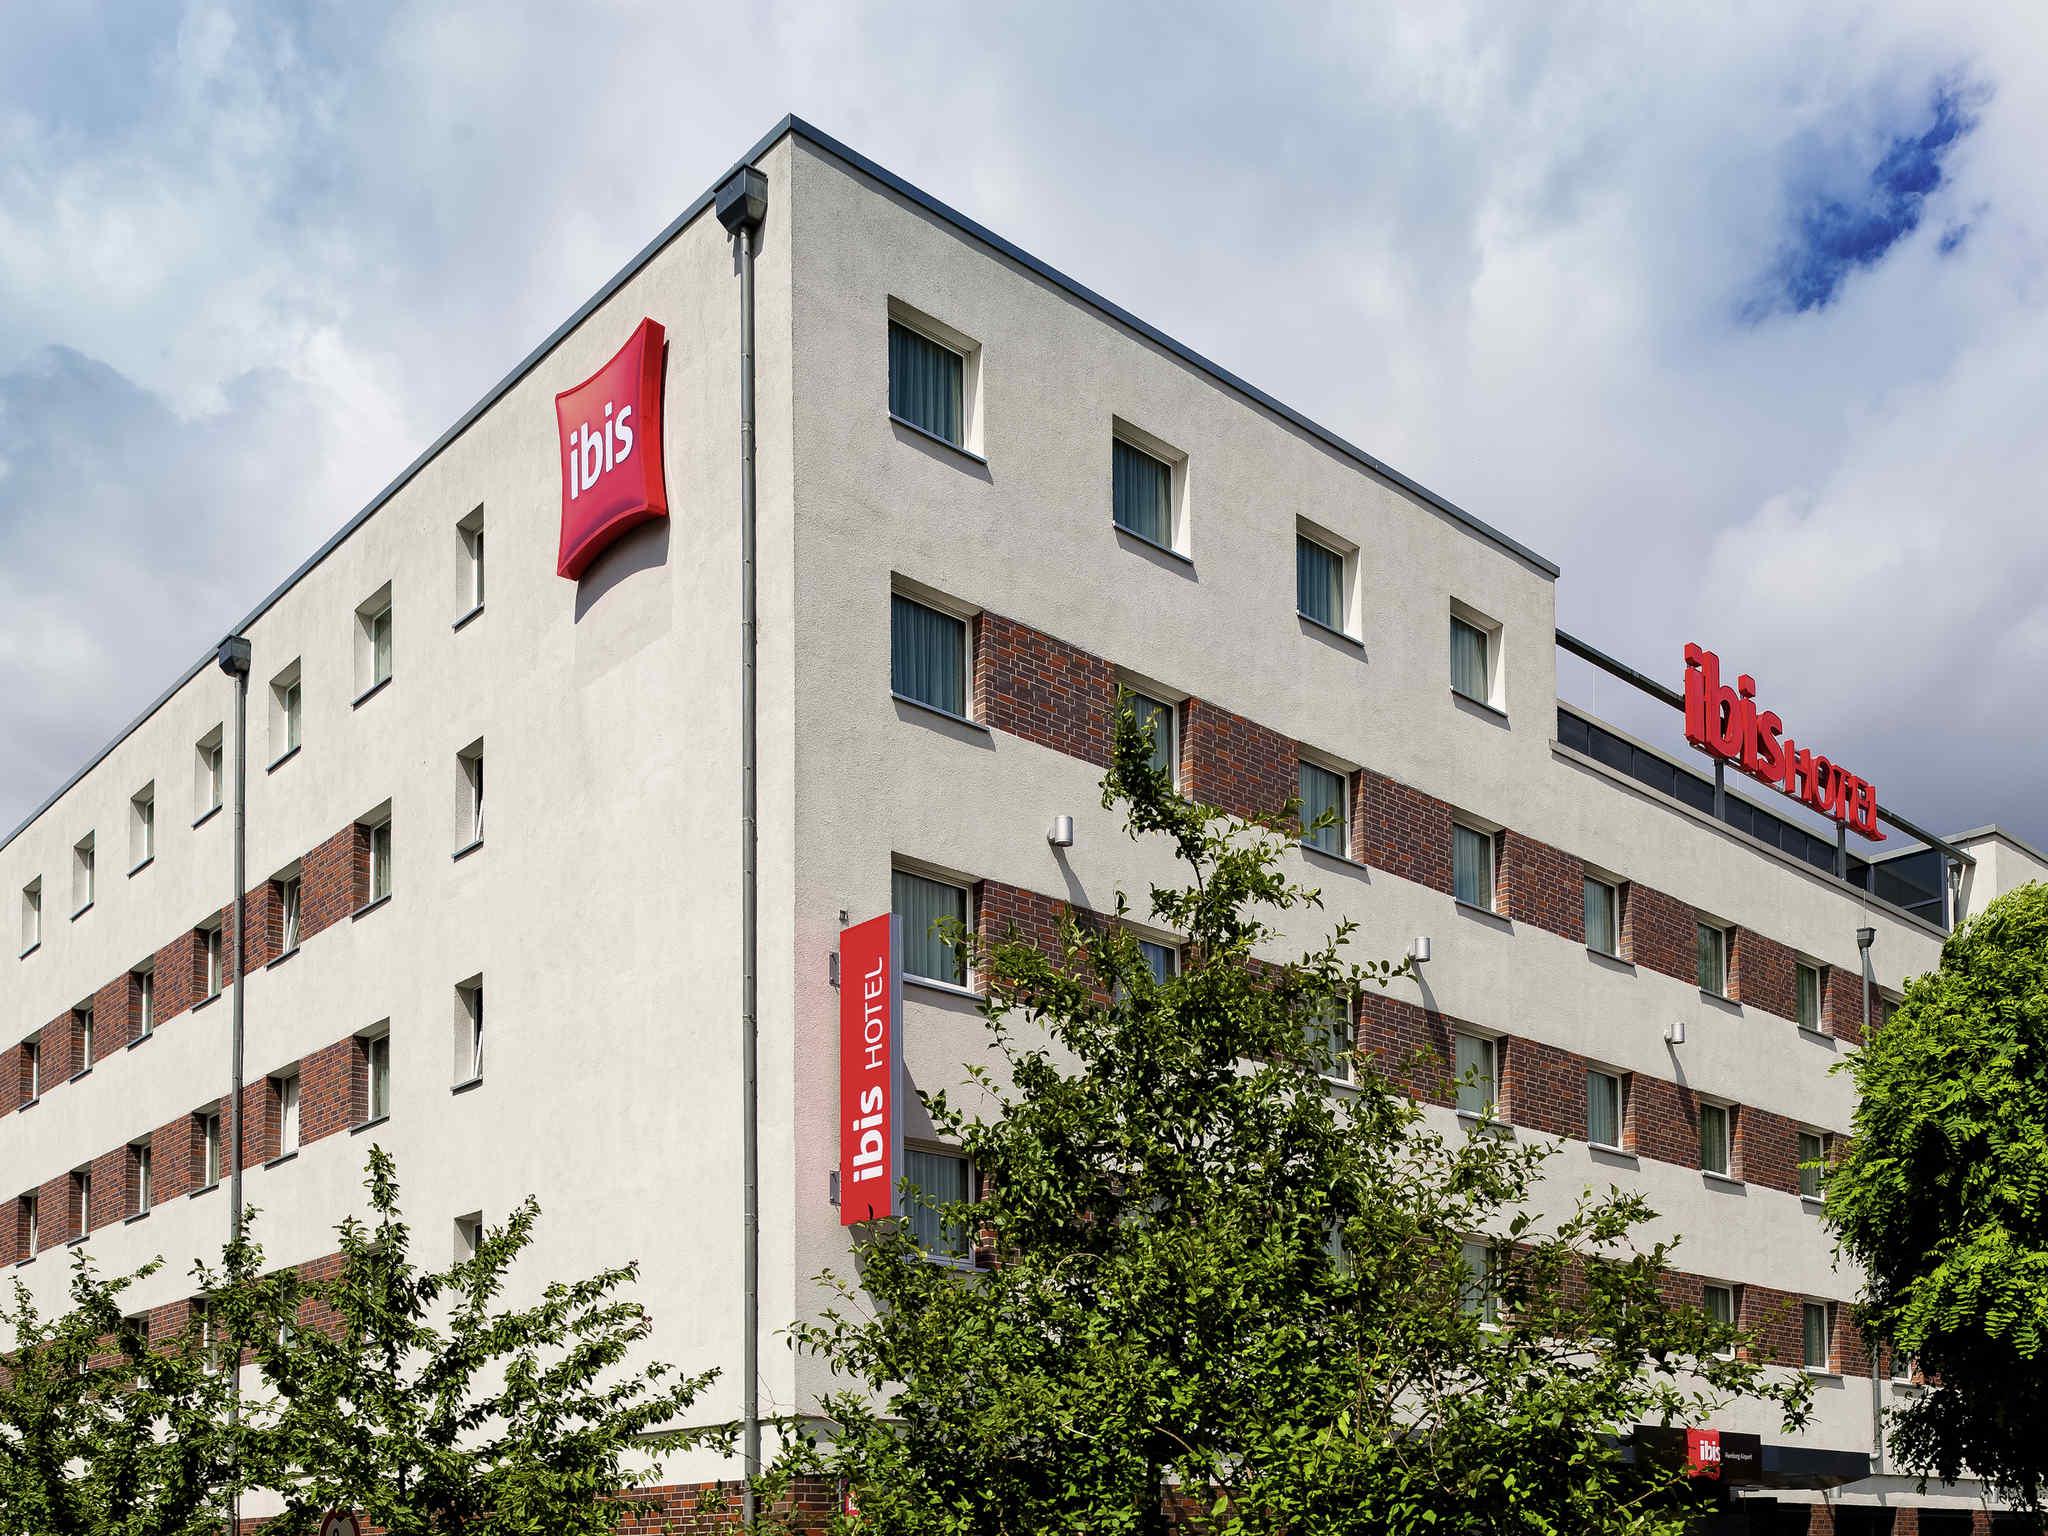 فندق - إيبيس ibis هامبورغ إيربورت